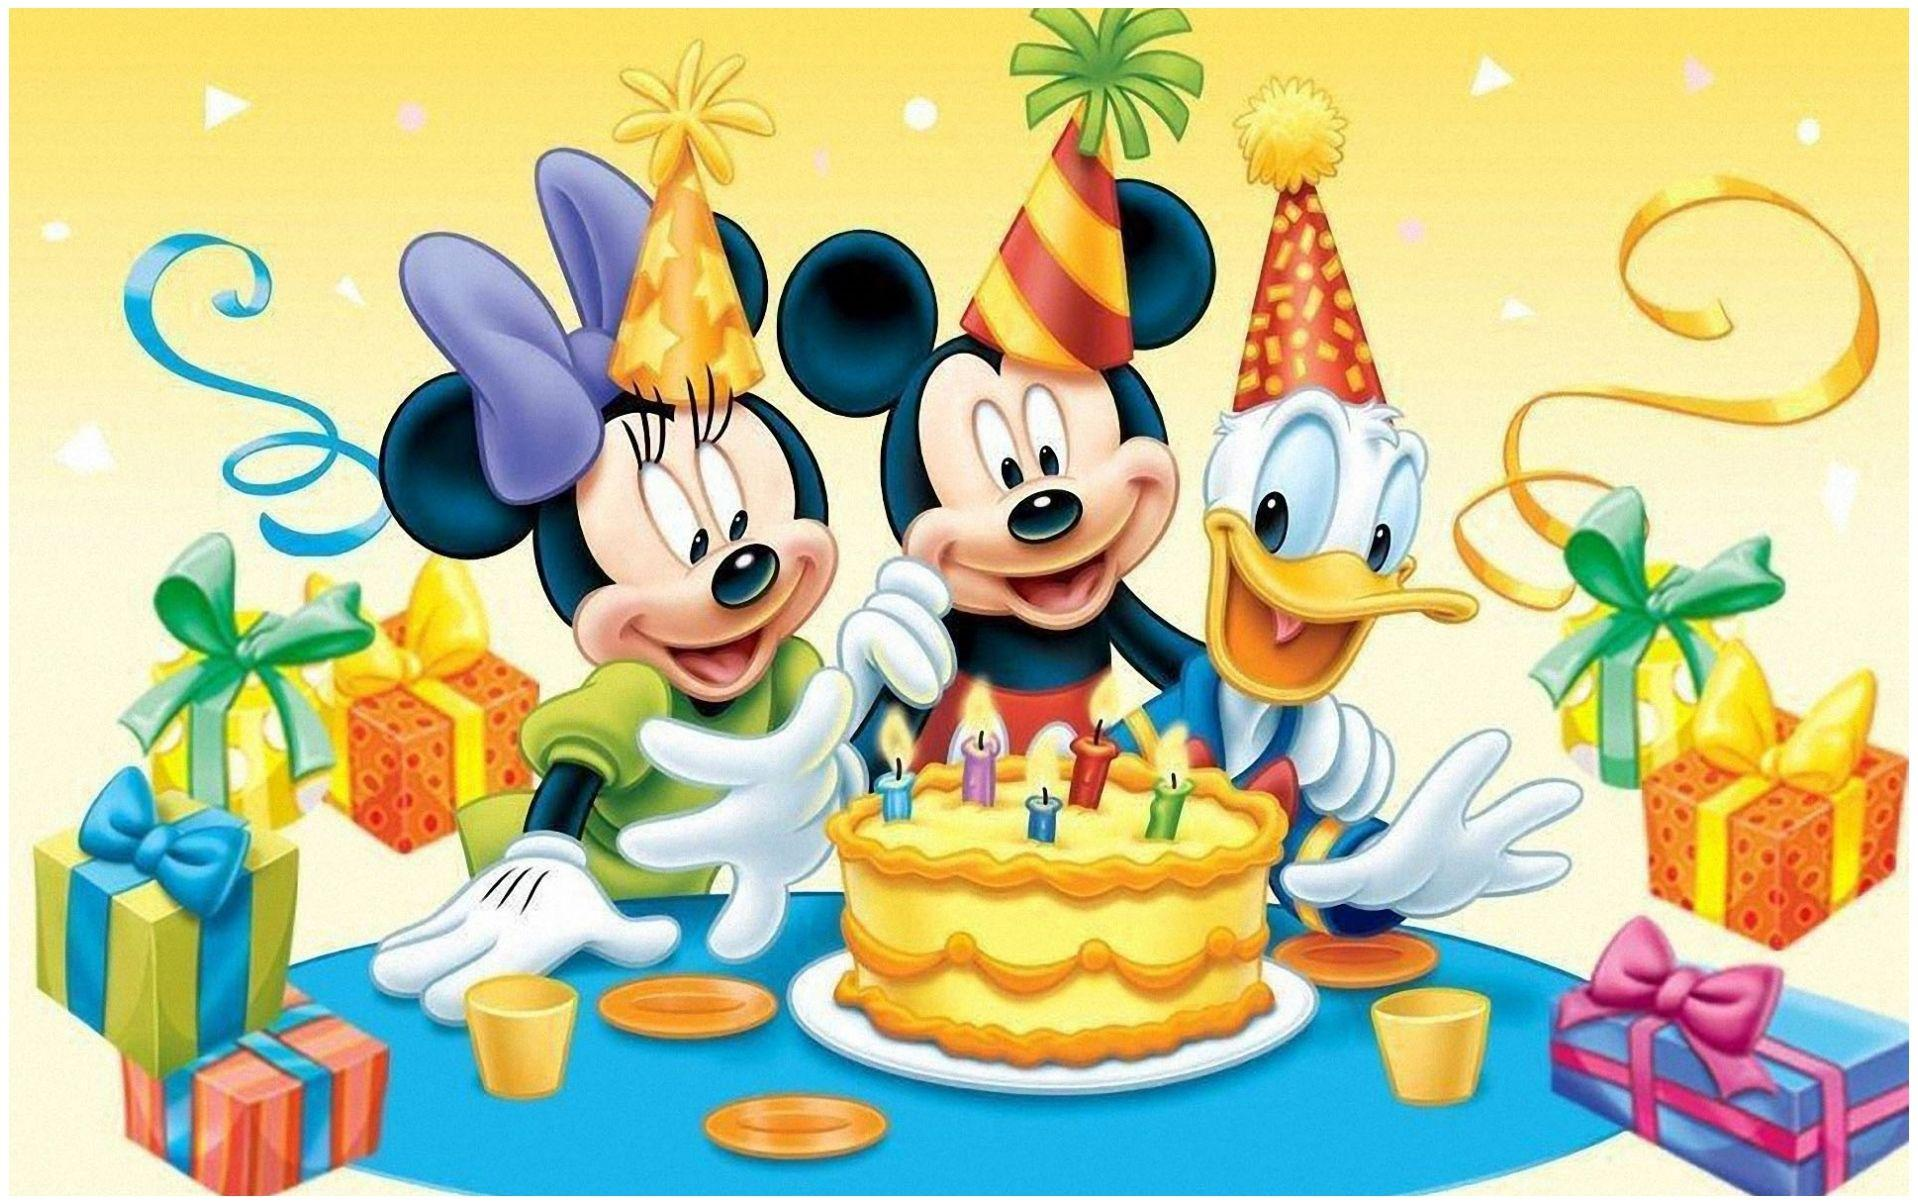 Disney Birthday Wallpapers Top Free Disney Birthday Backgrounds Wallpaperaccess